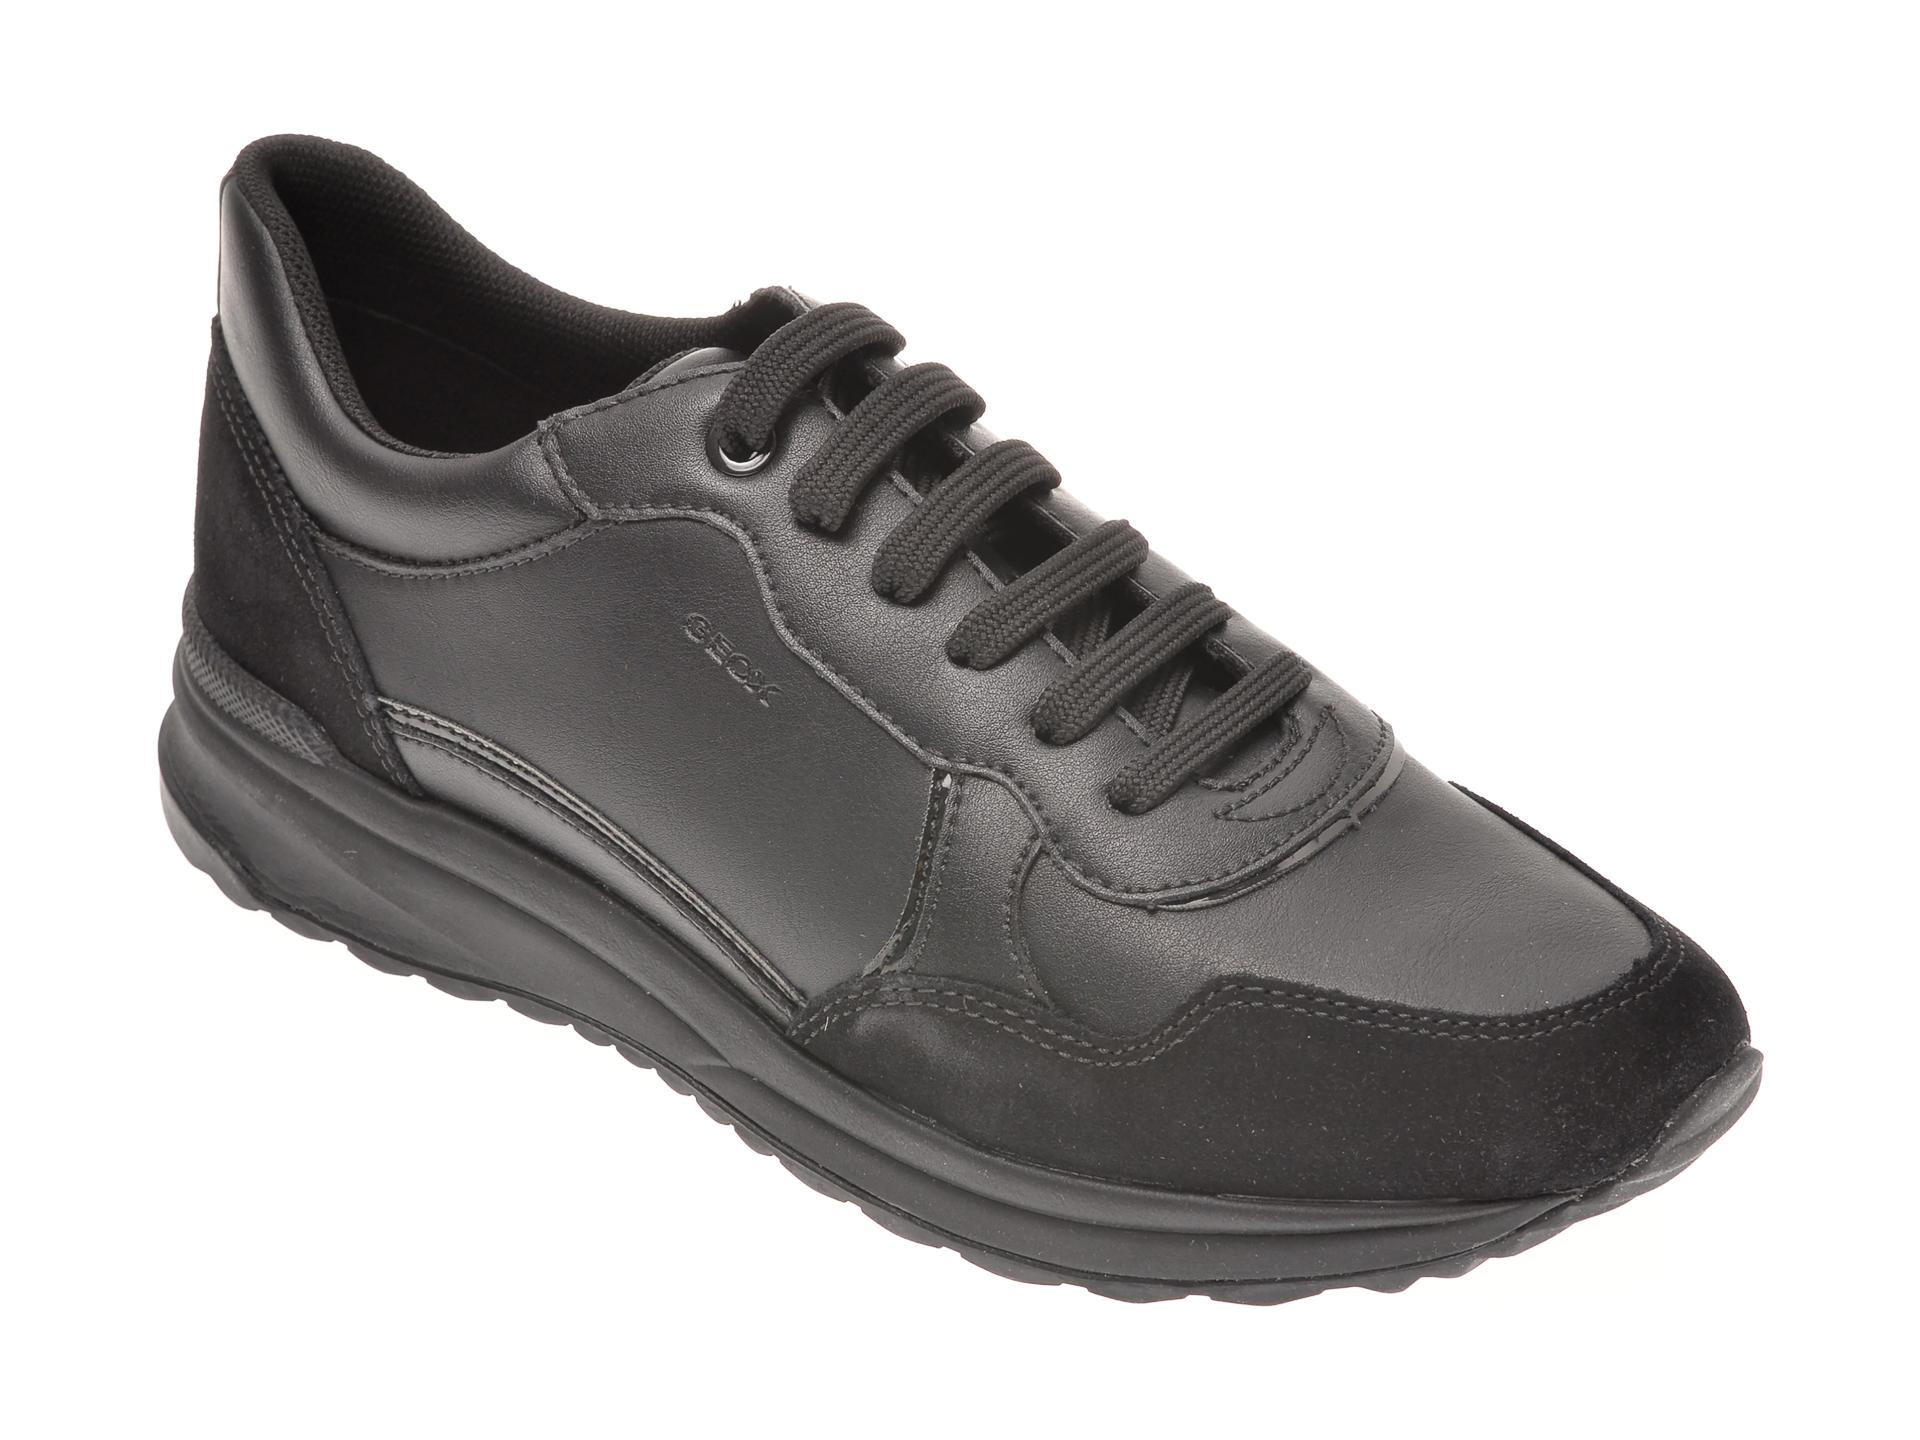 Pantofi GEOX negri, D042SA, din piele ecologica